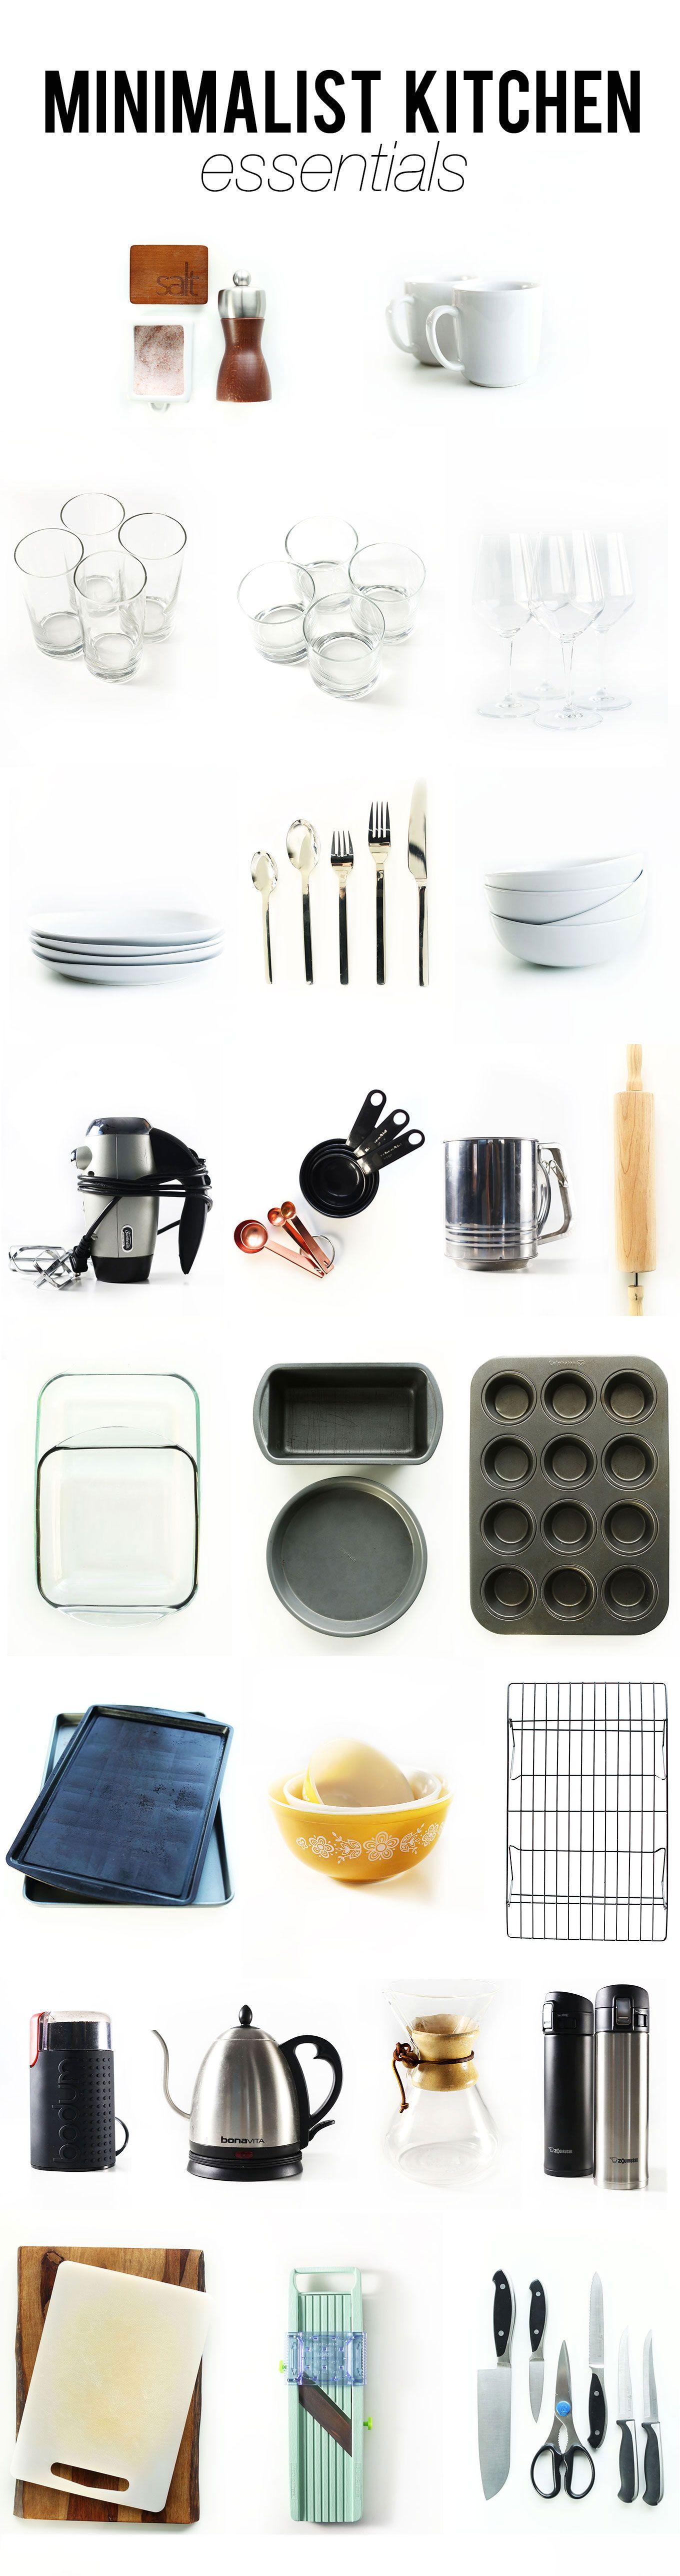 Minimalist Kitchen Essentials | MinimalistBaker.com